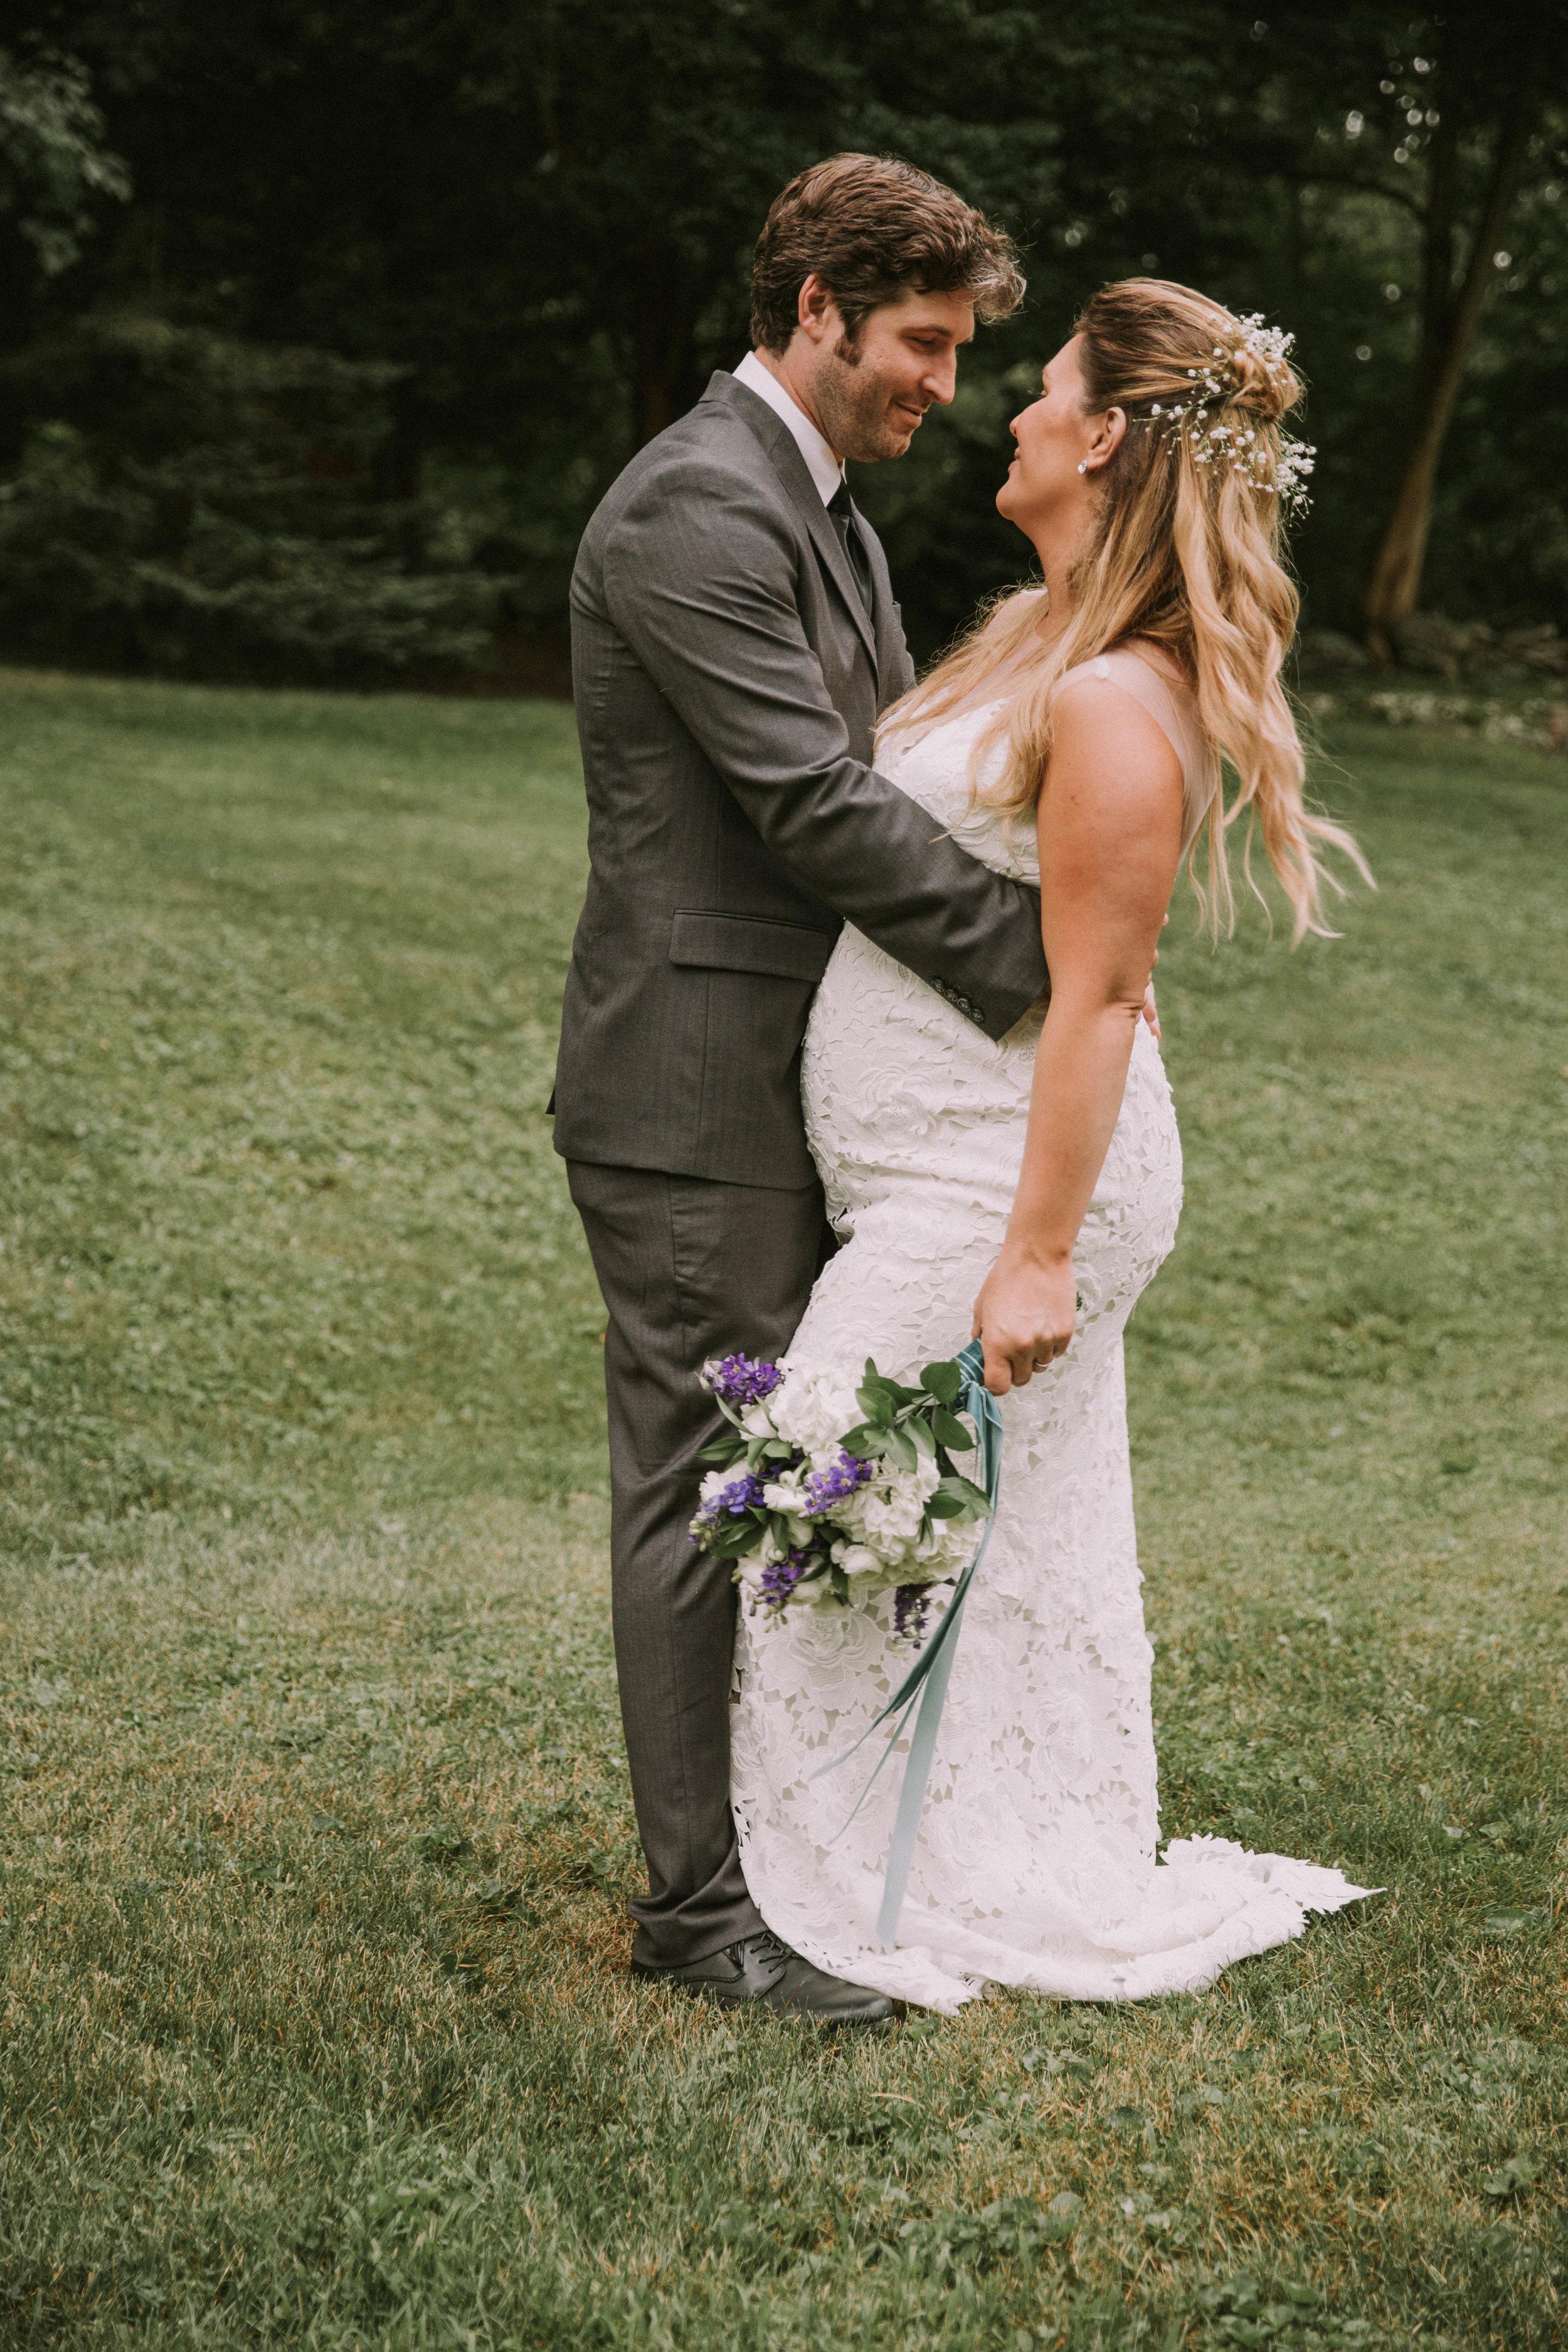 spitale-elopement-blog-18-of-18.jpg